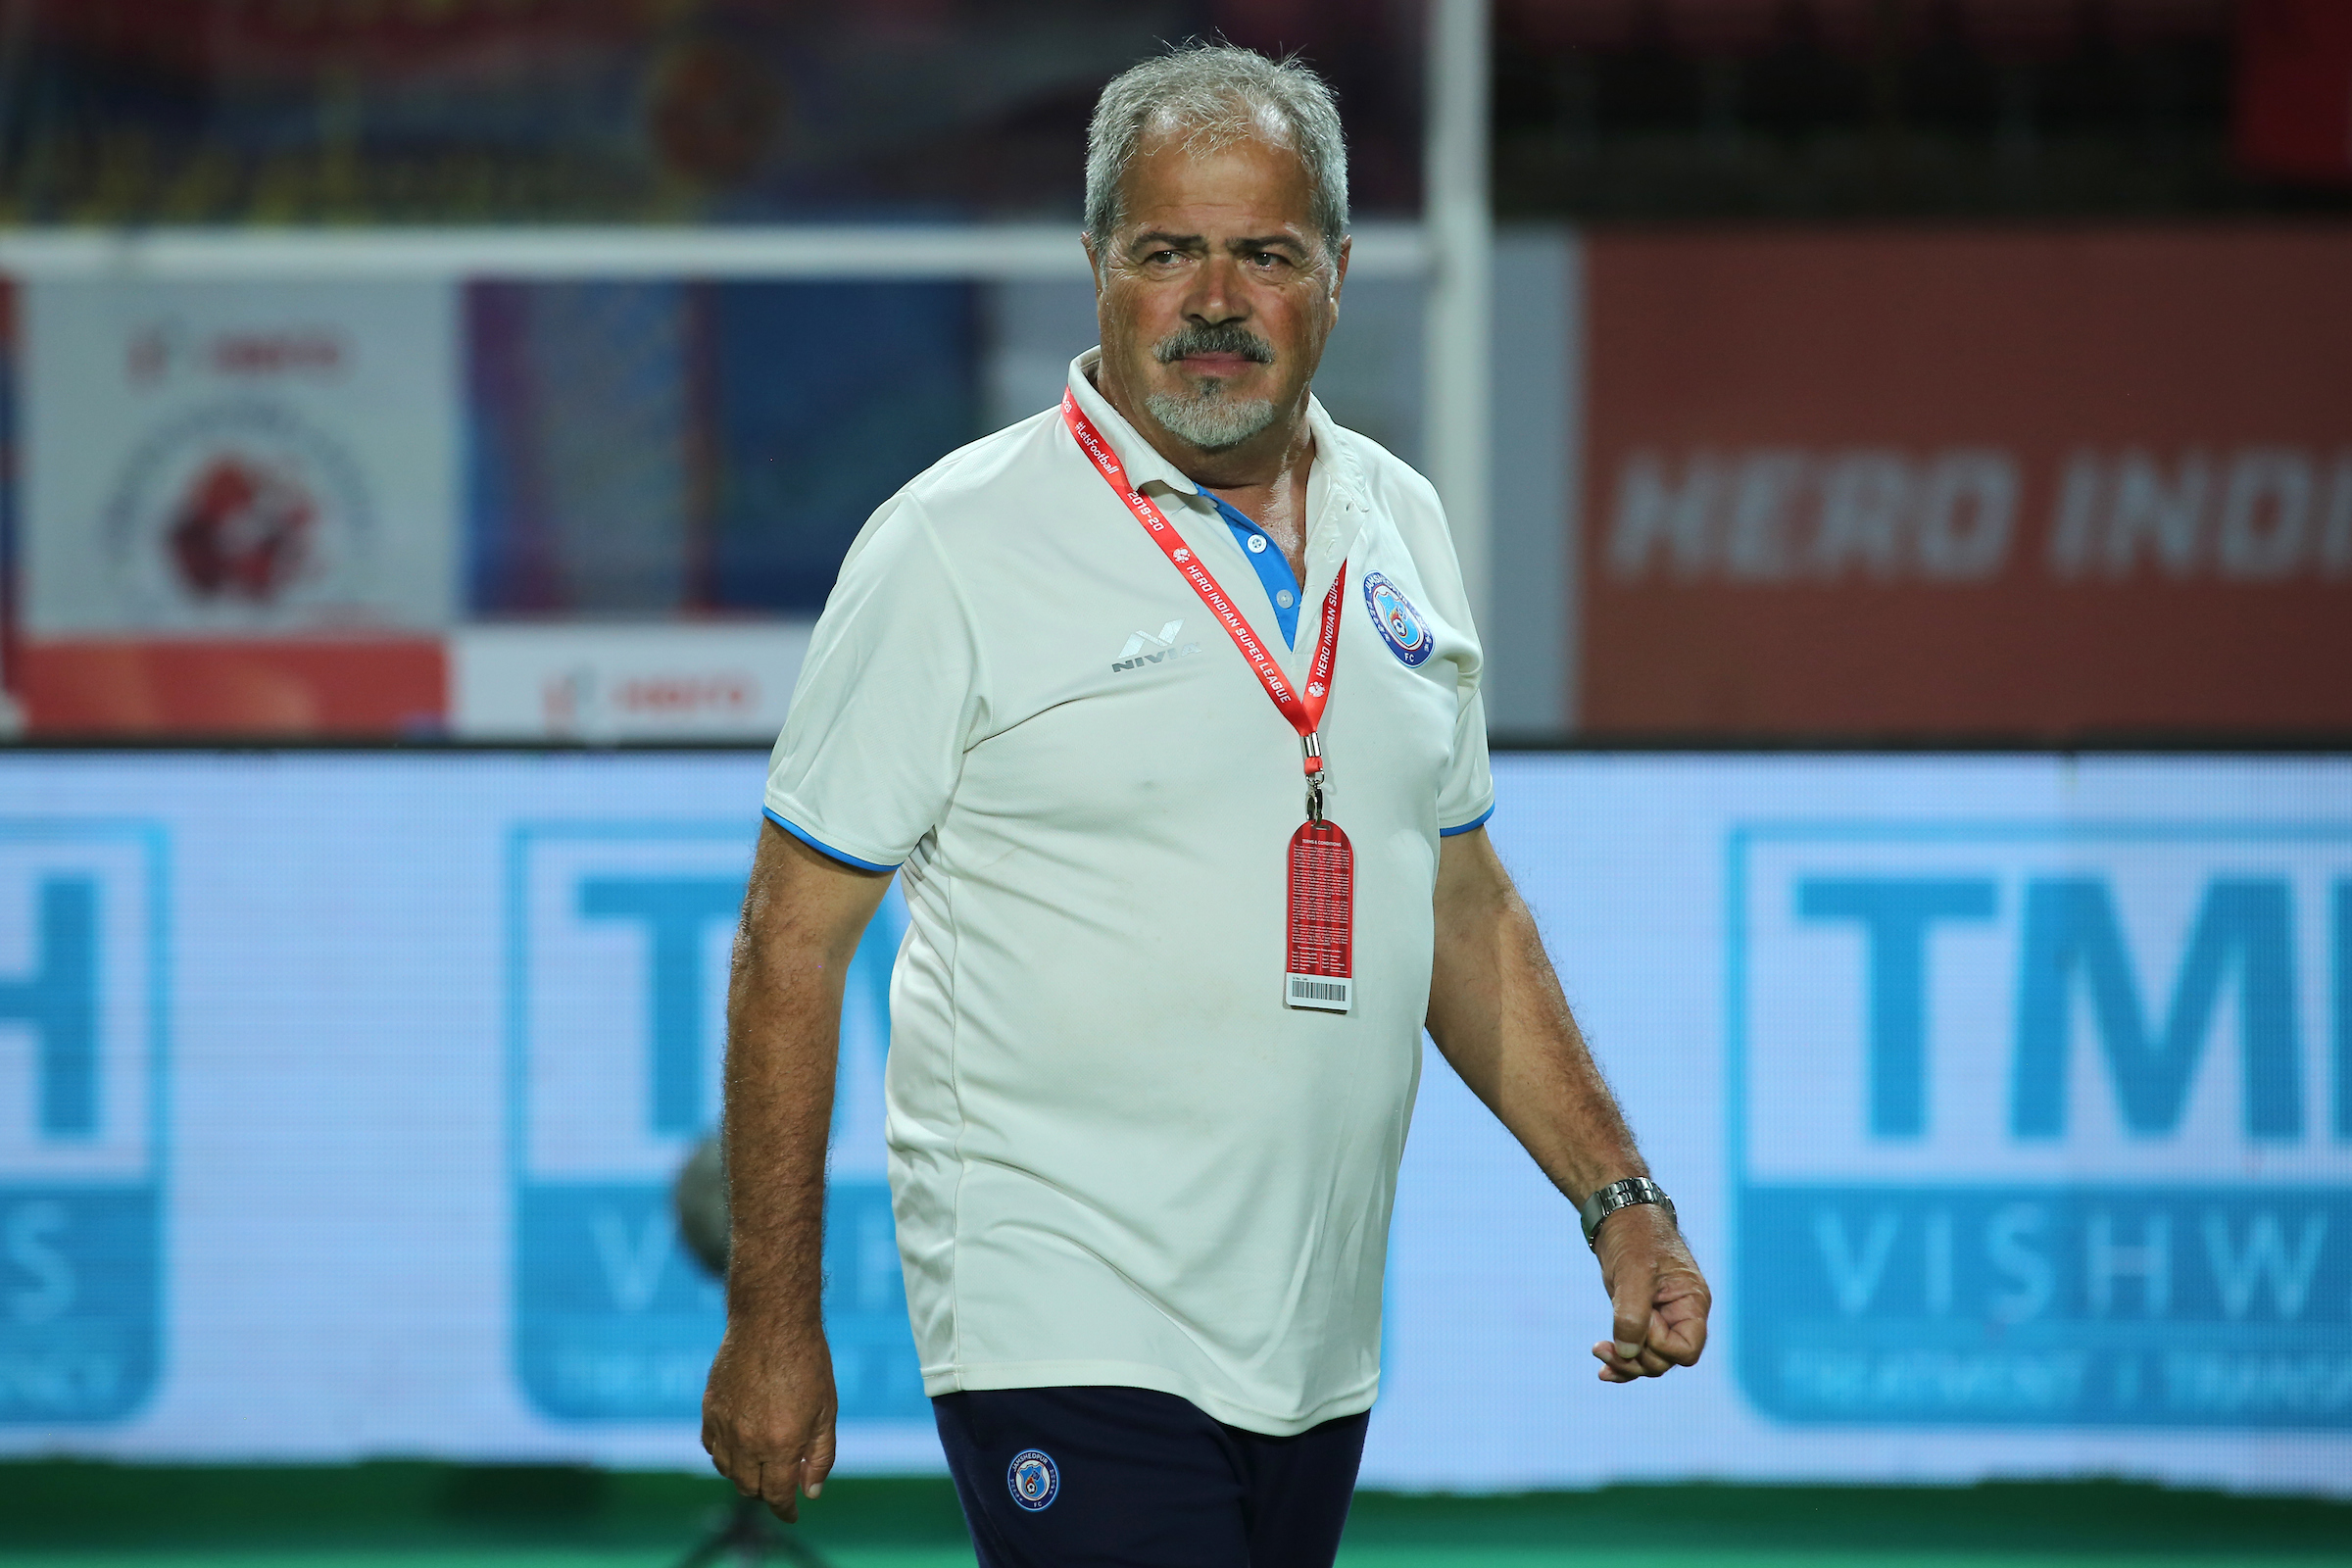 Antonio Iriondo backs Jamshedpur to end winless run 'soon'